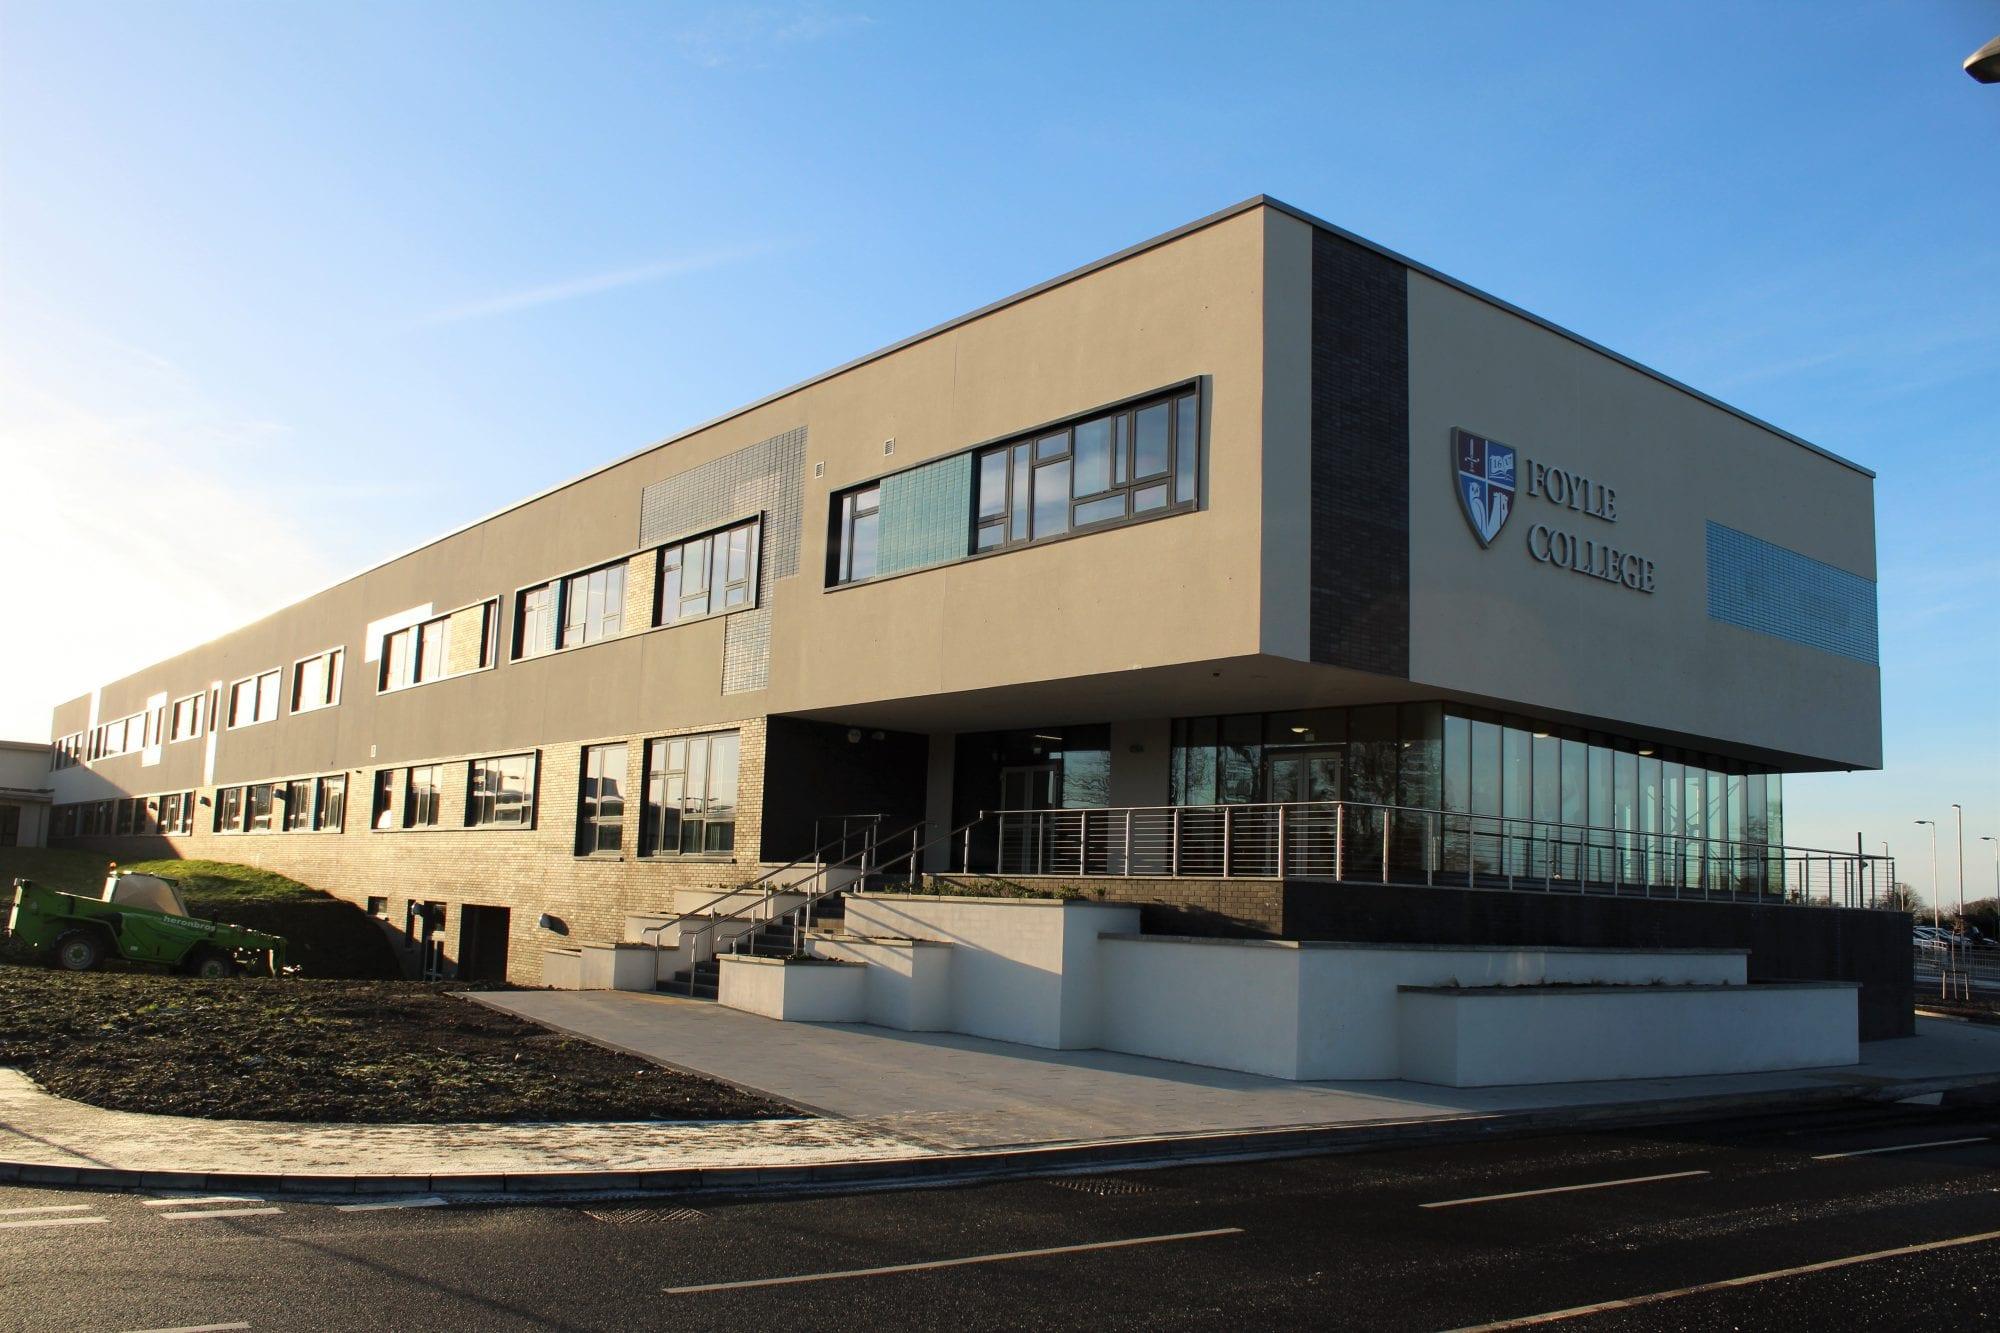 Foyle College And Ebrington Ps Nursery Building Construction Engineering Property Development Heron Bros Ltd